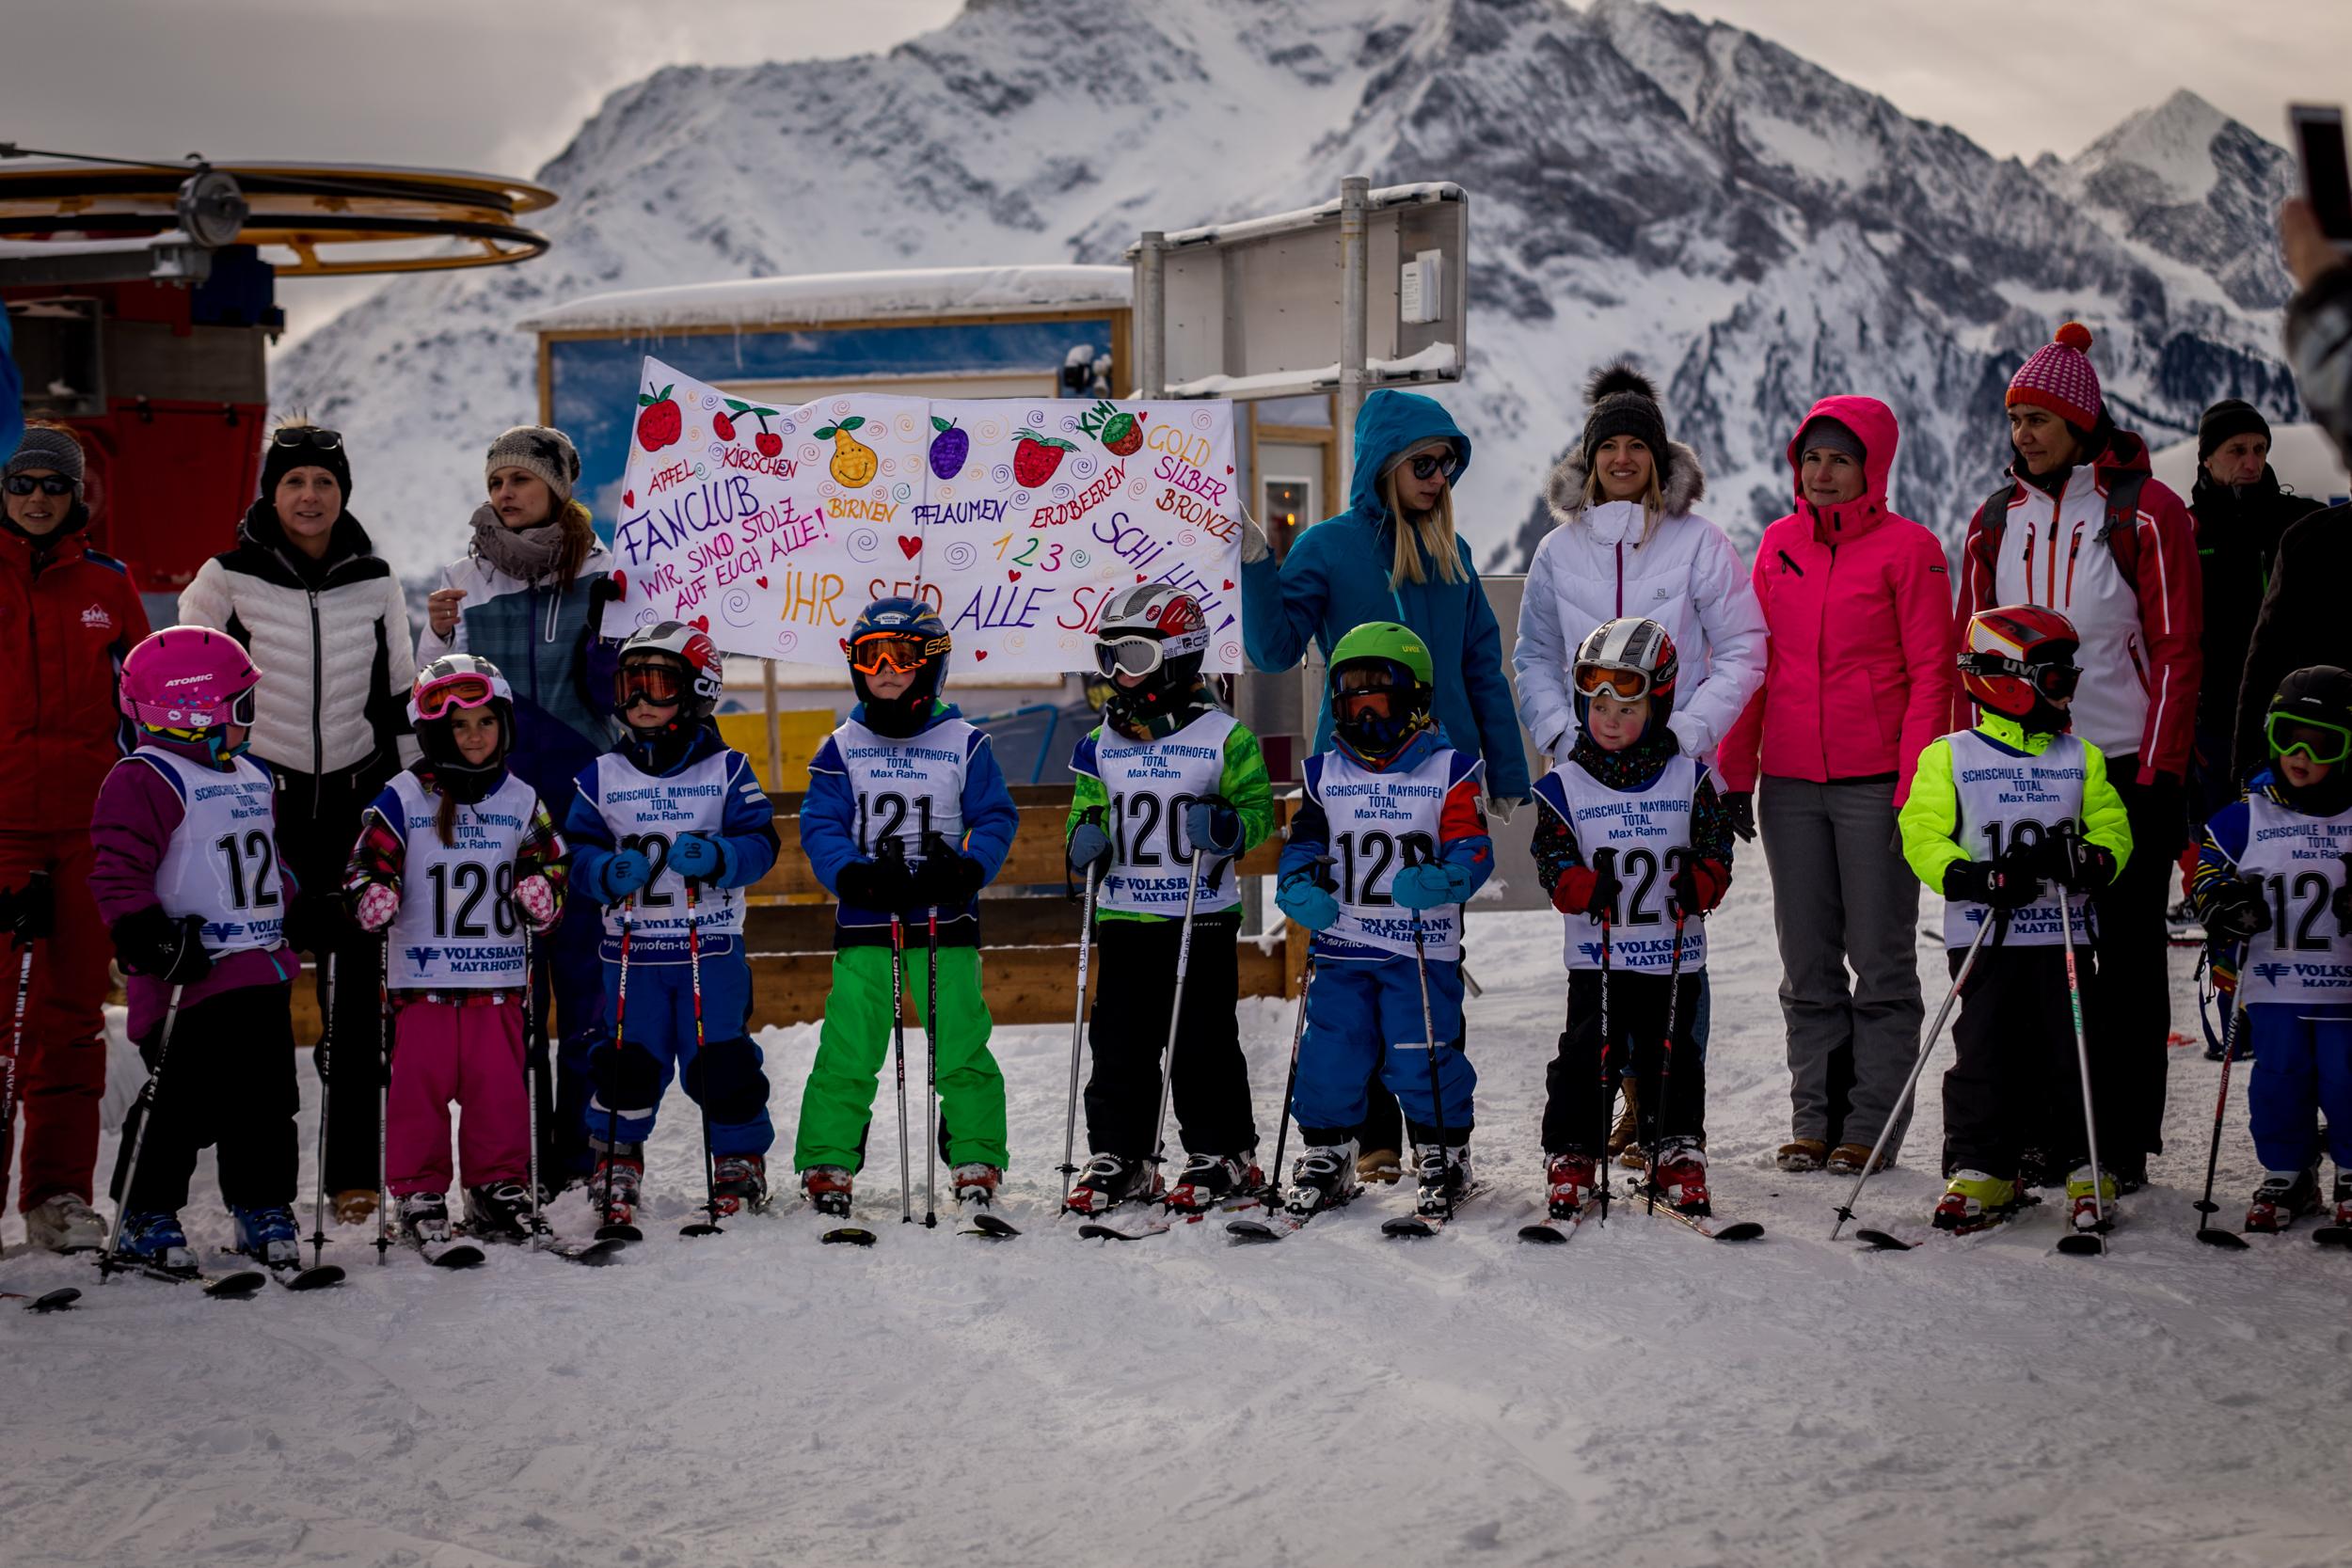 ski race 16_0160.jpg